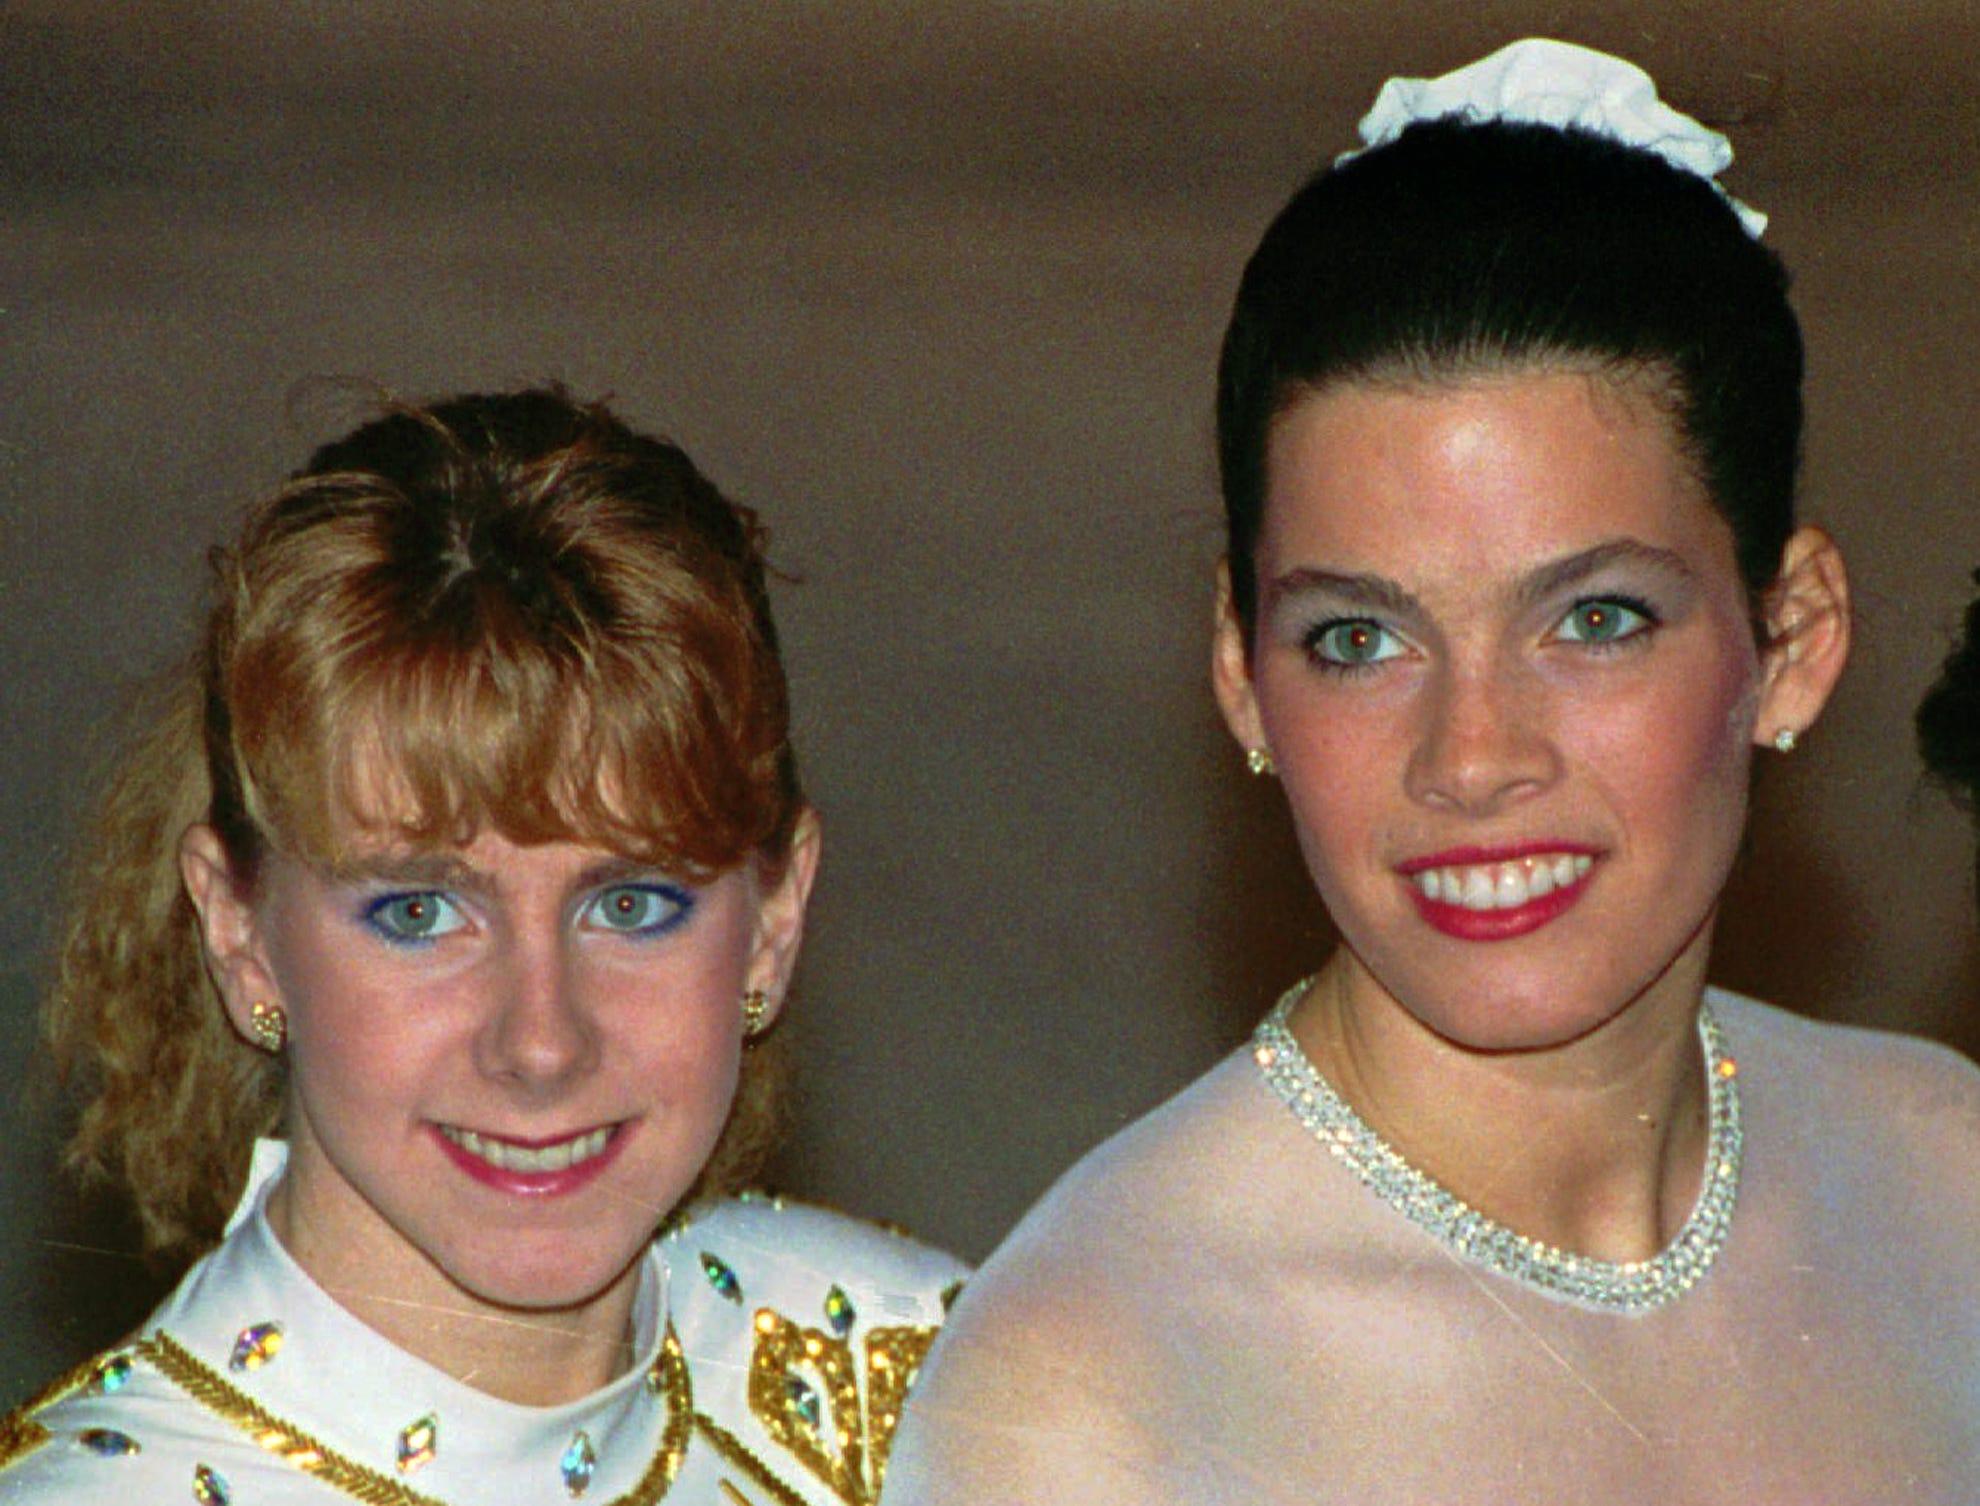 1388702724000 AP Tonya and Nancy The Impact Figure Skating tonya, nancy reflect on the whack heard 'round the world